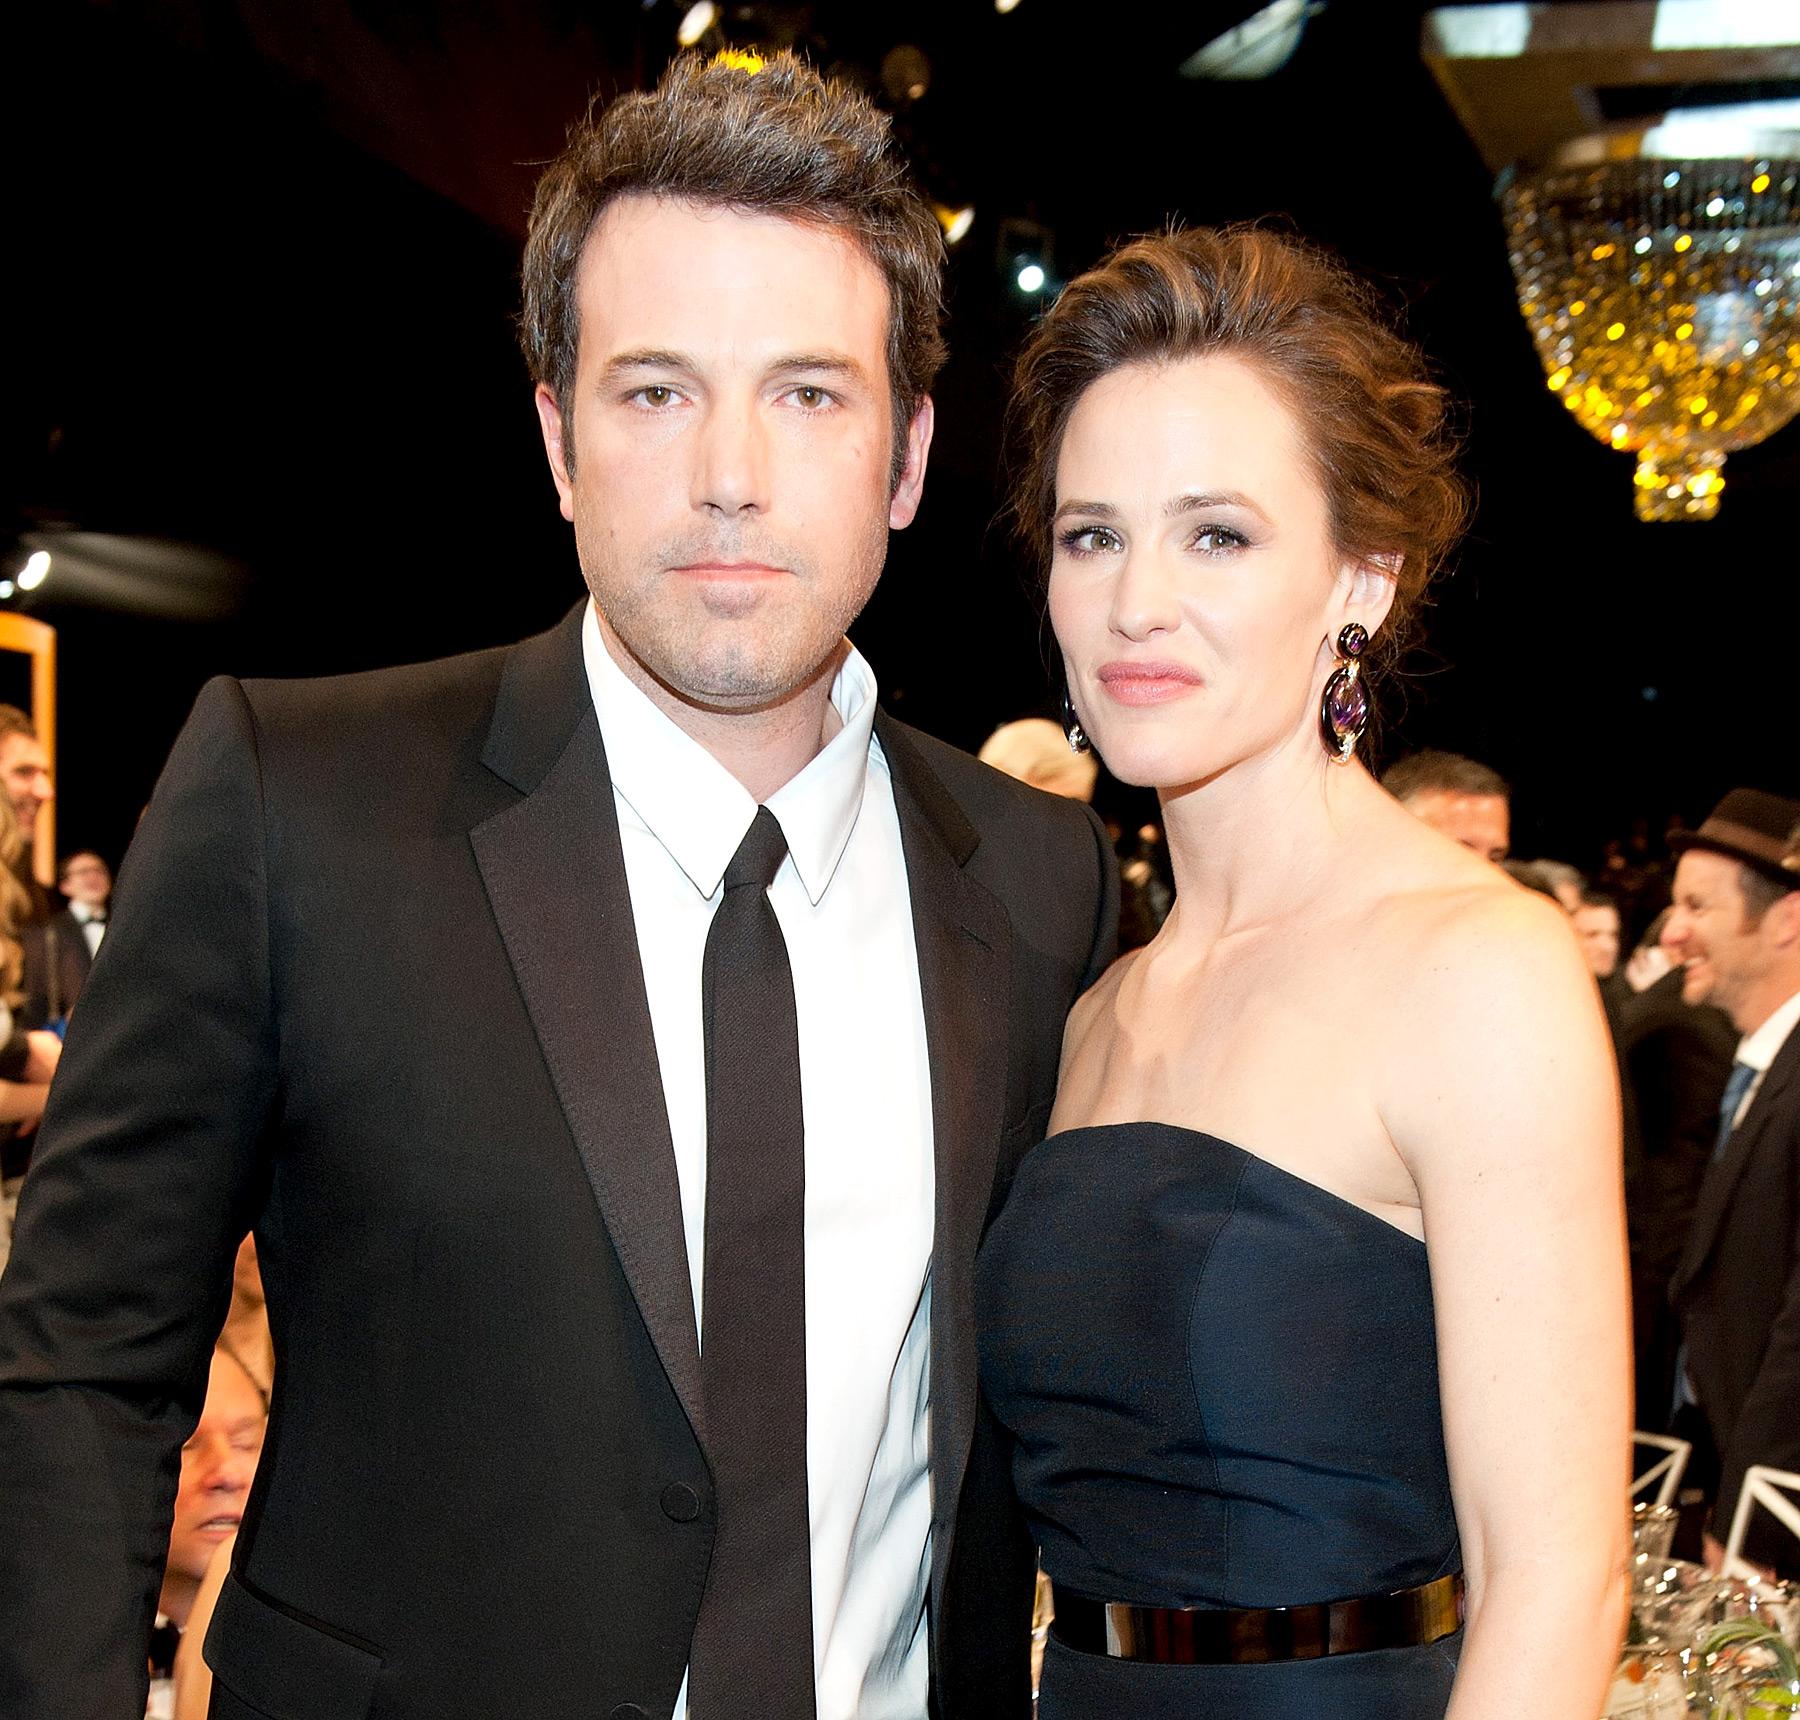 هوليوود تجتاح طلاقاً جديداً بين نجمين معروفين